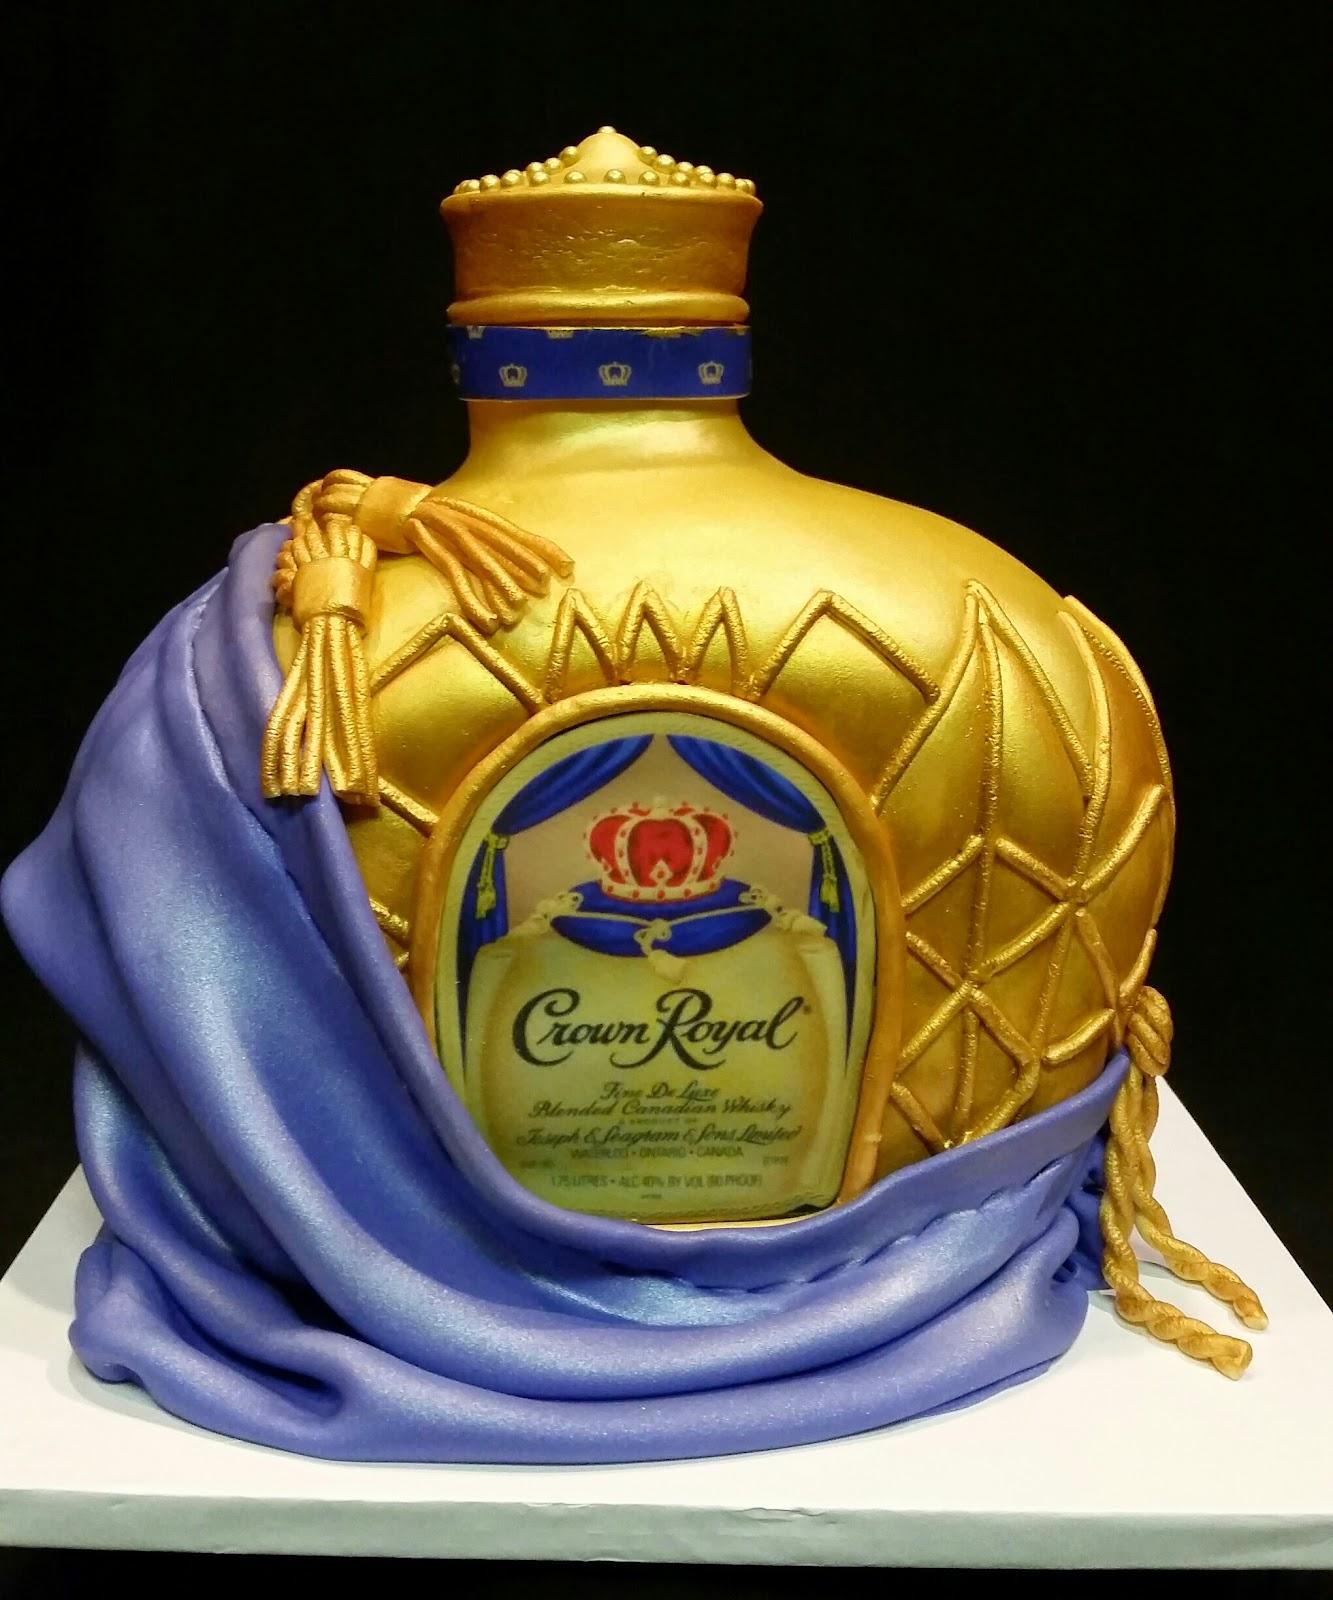 MyMoniCakes: Crown Royal bottle cake